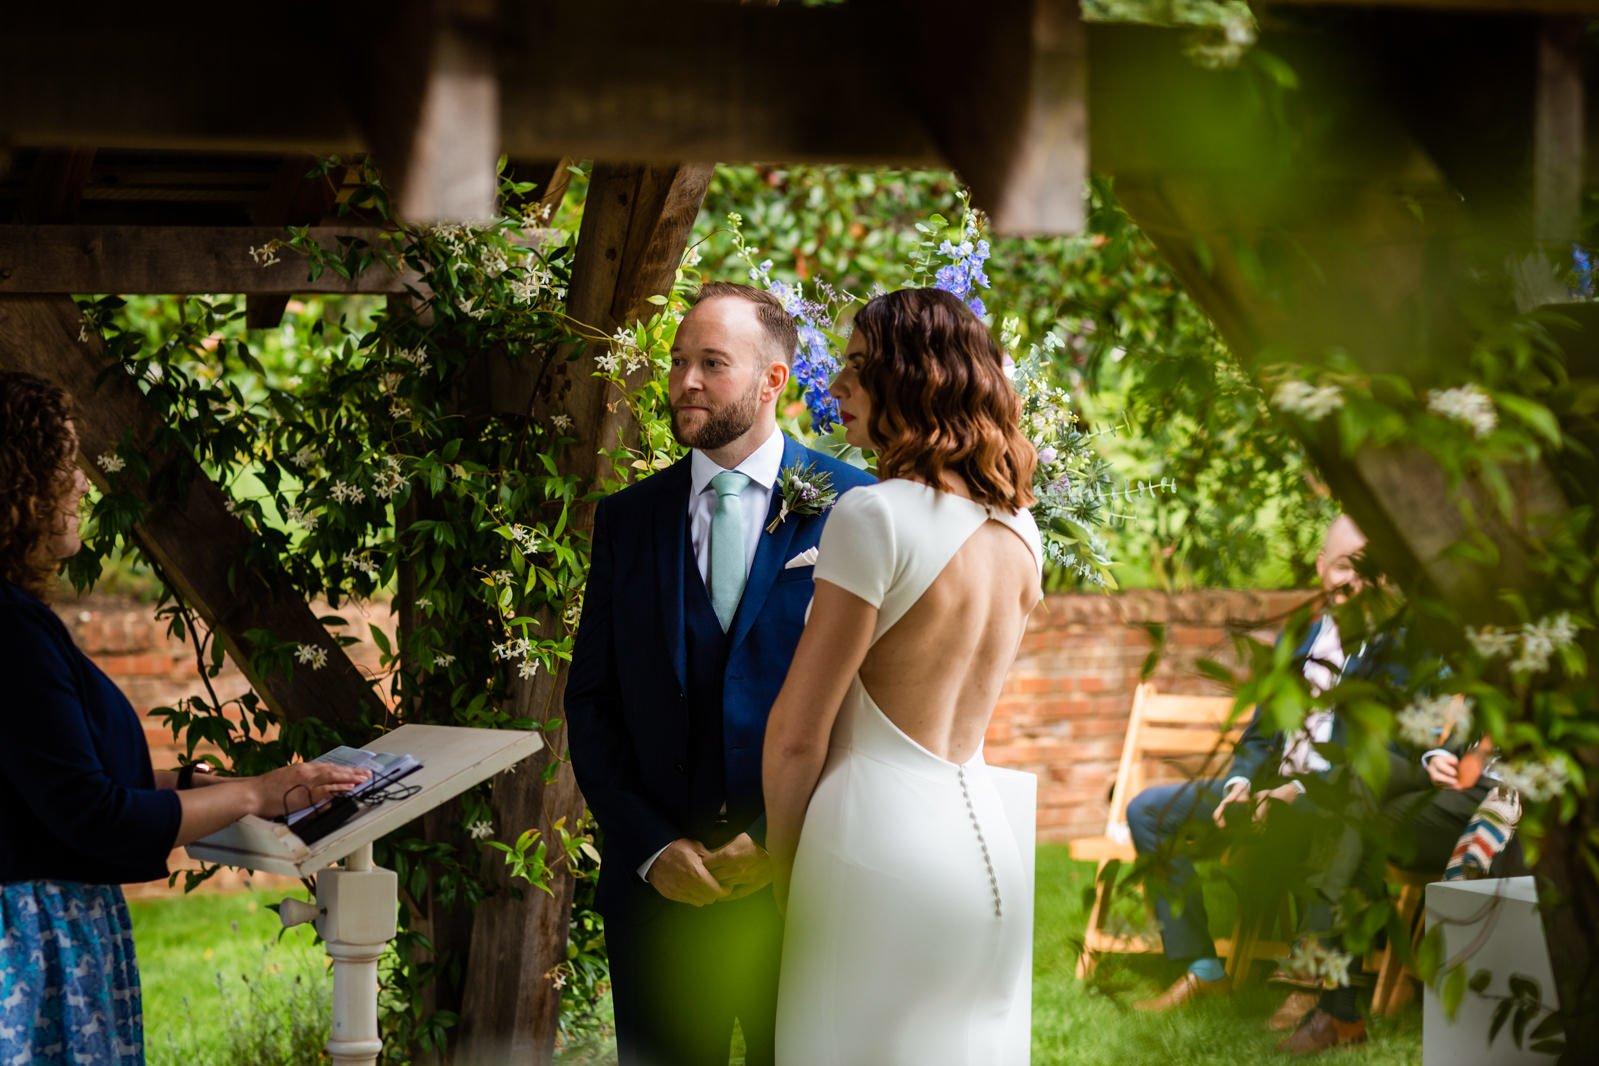 Millbridge Court Wedding - stunning summer wedding - wedding photography 55